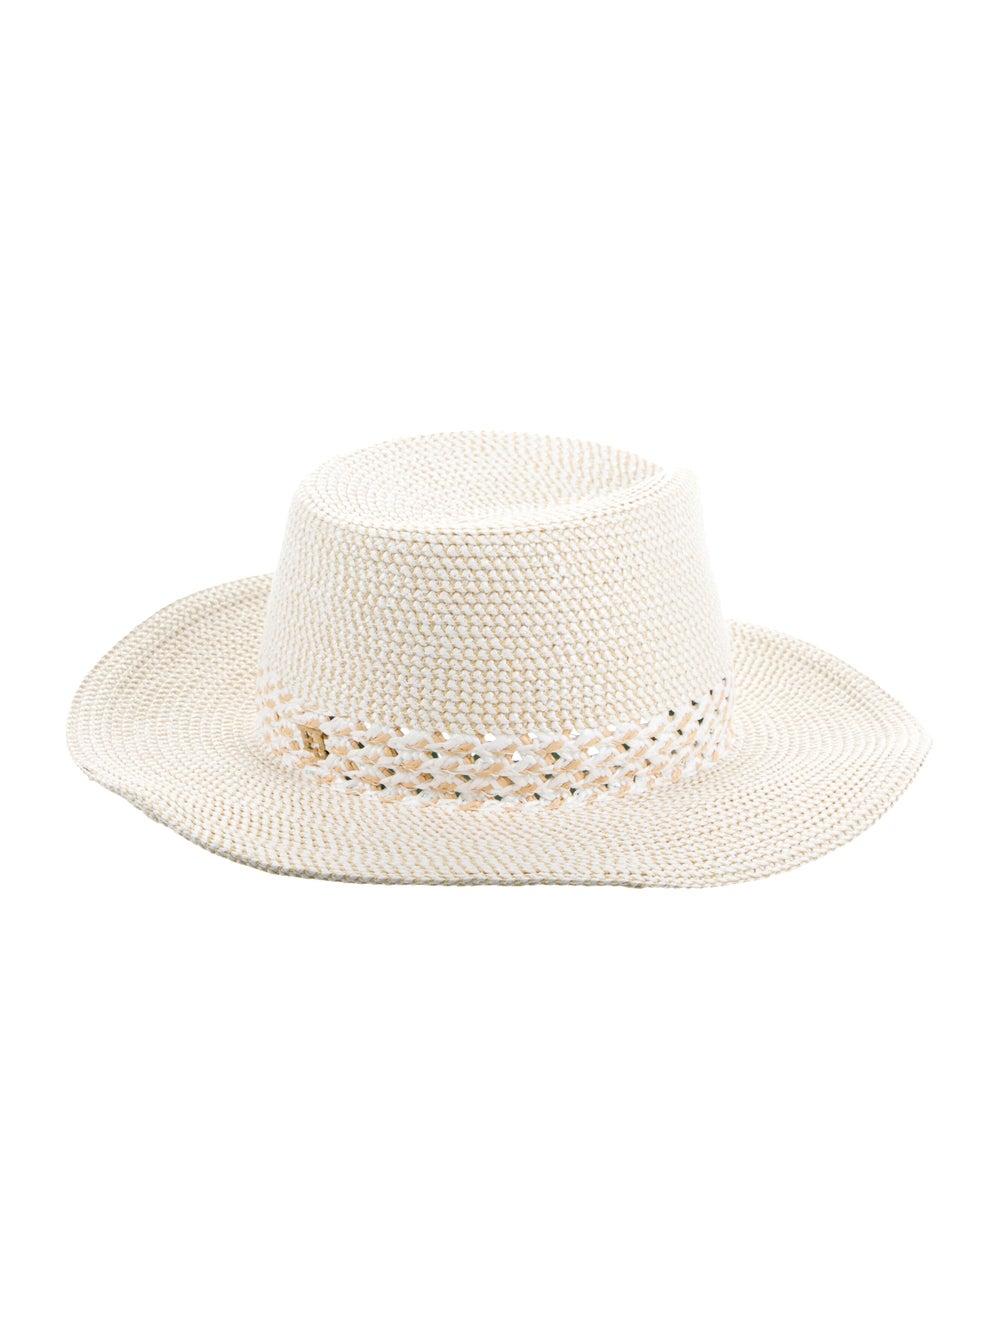 Eric Javits Woven Straw Hat white - image 2